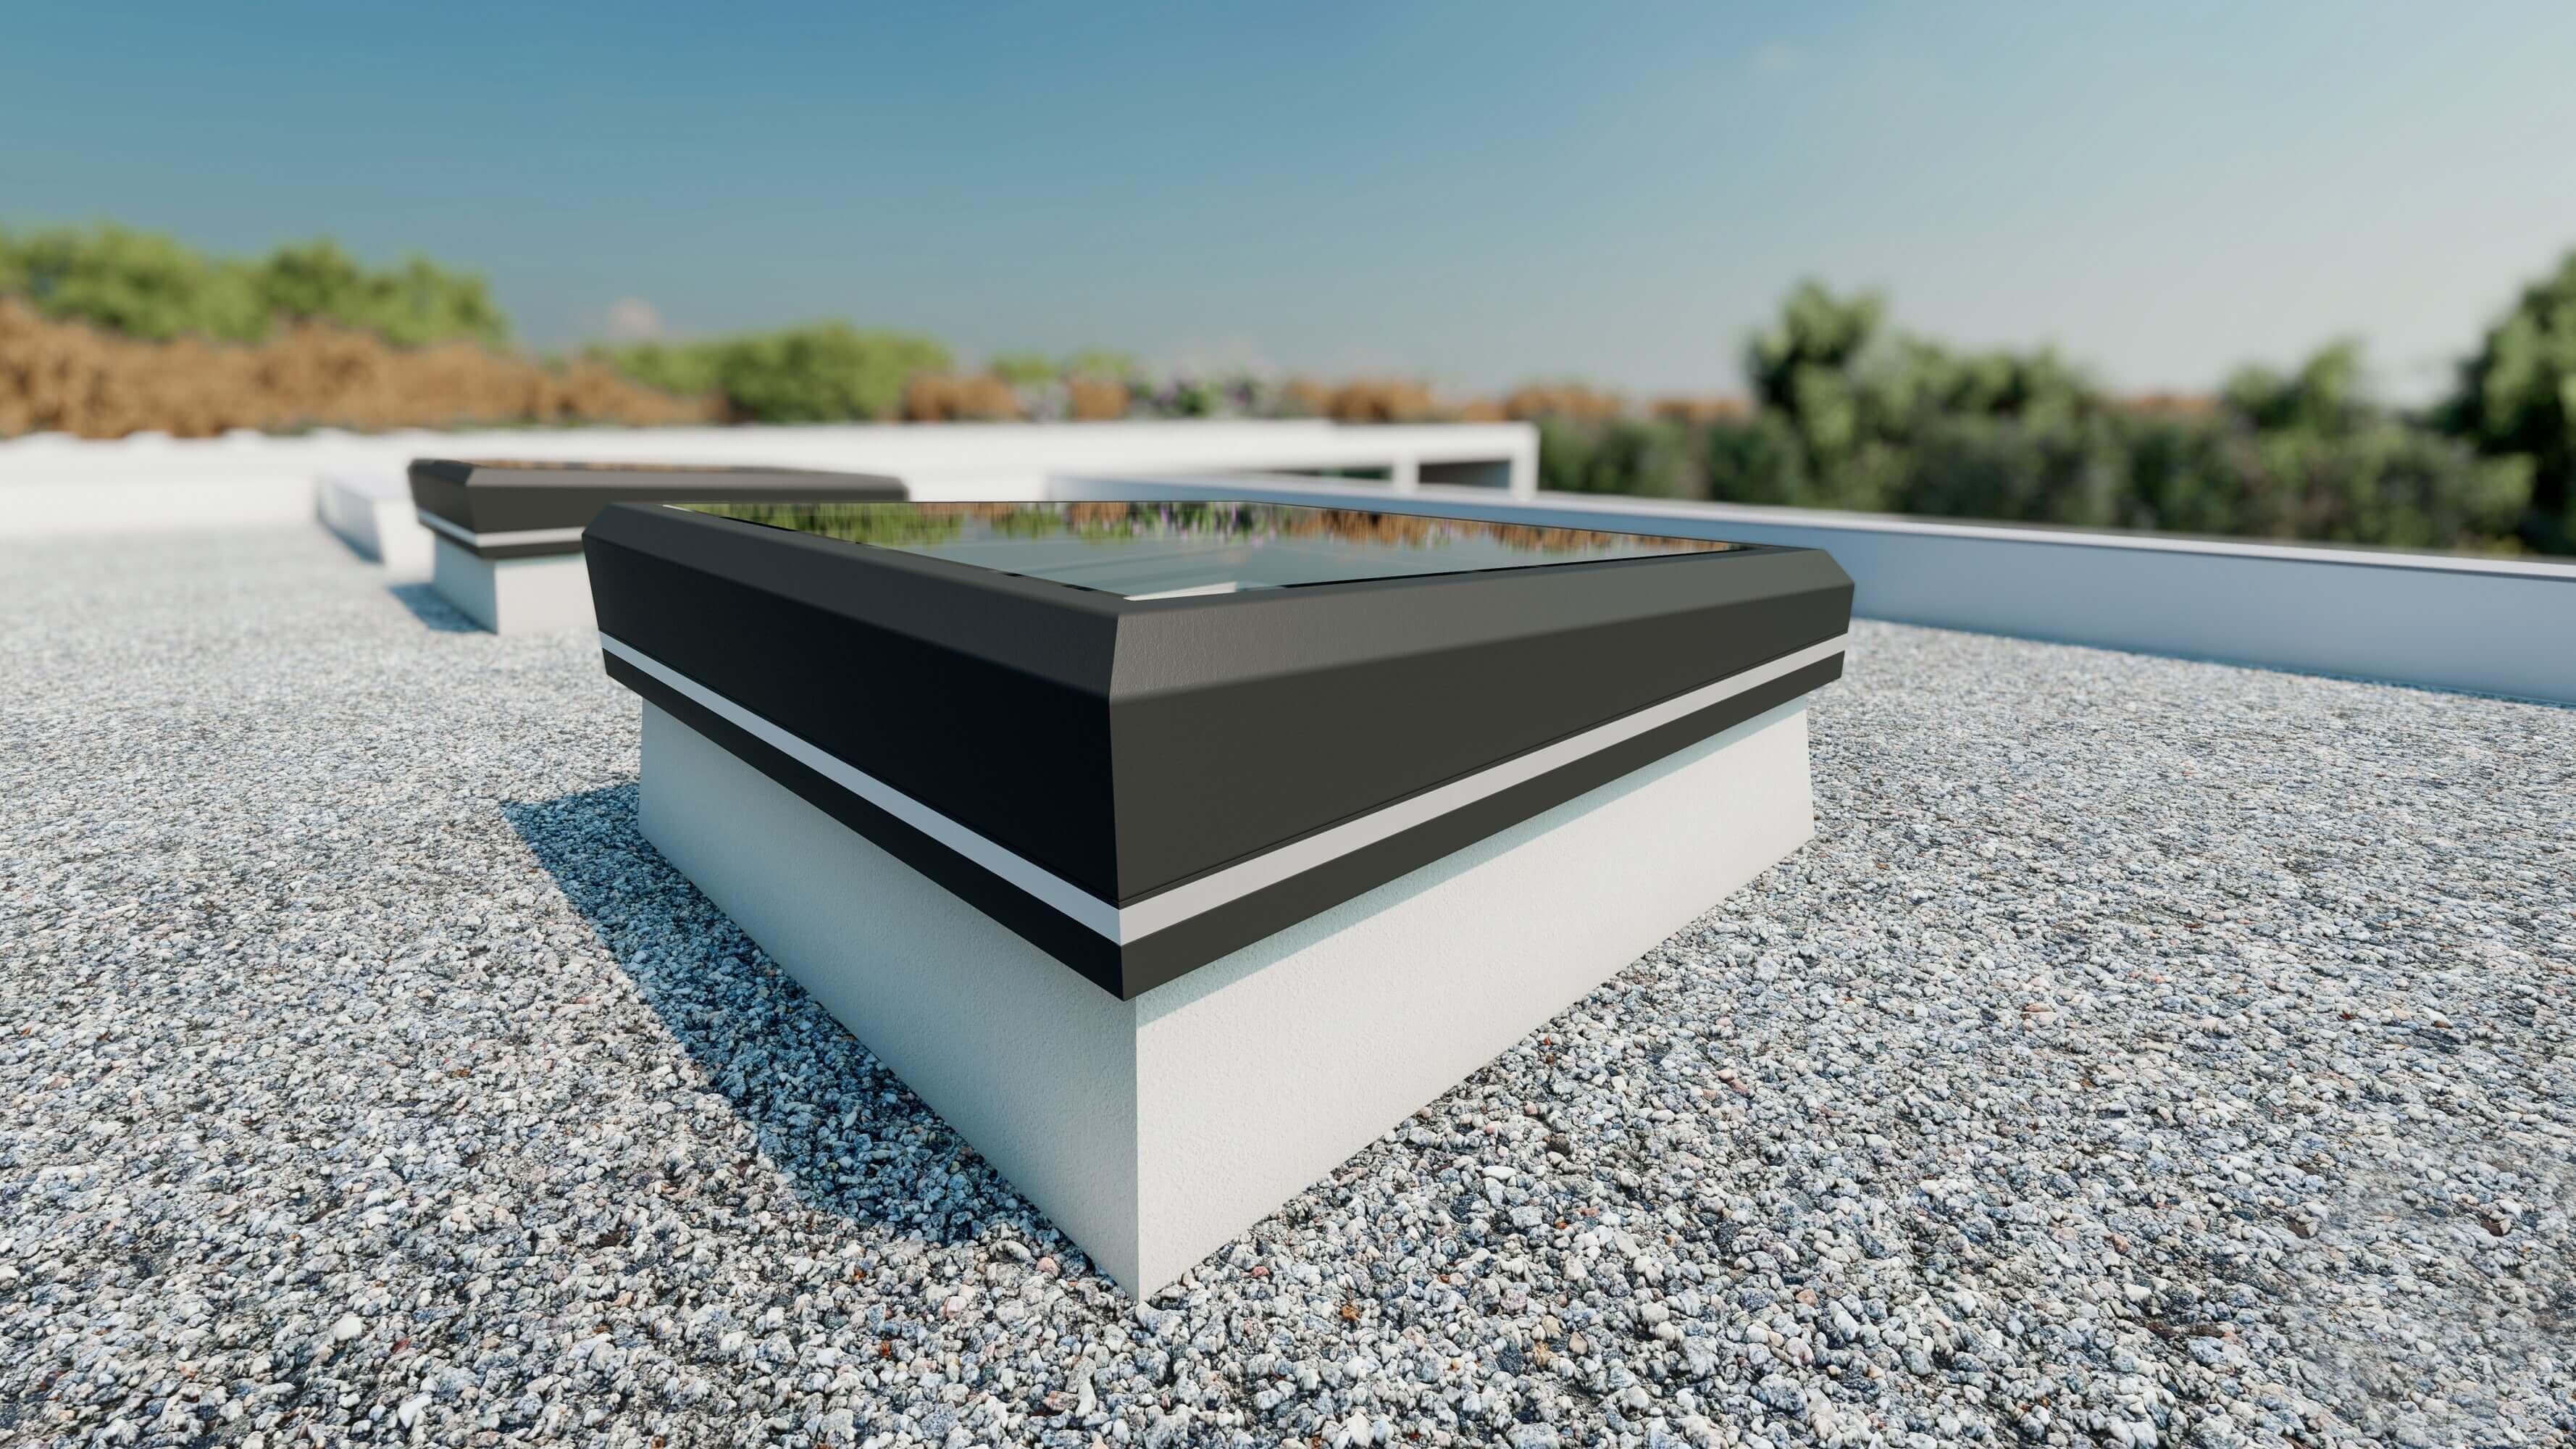 LAMILUX-Flachdach-Fenster-FE-Tageslichtsysteme